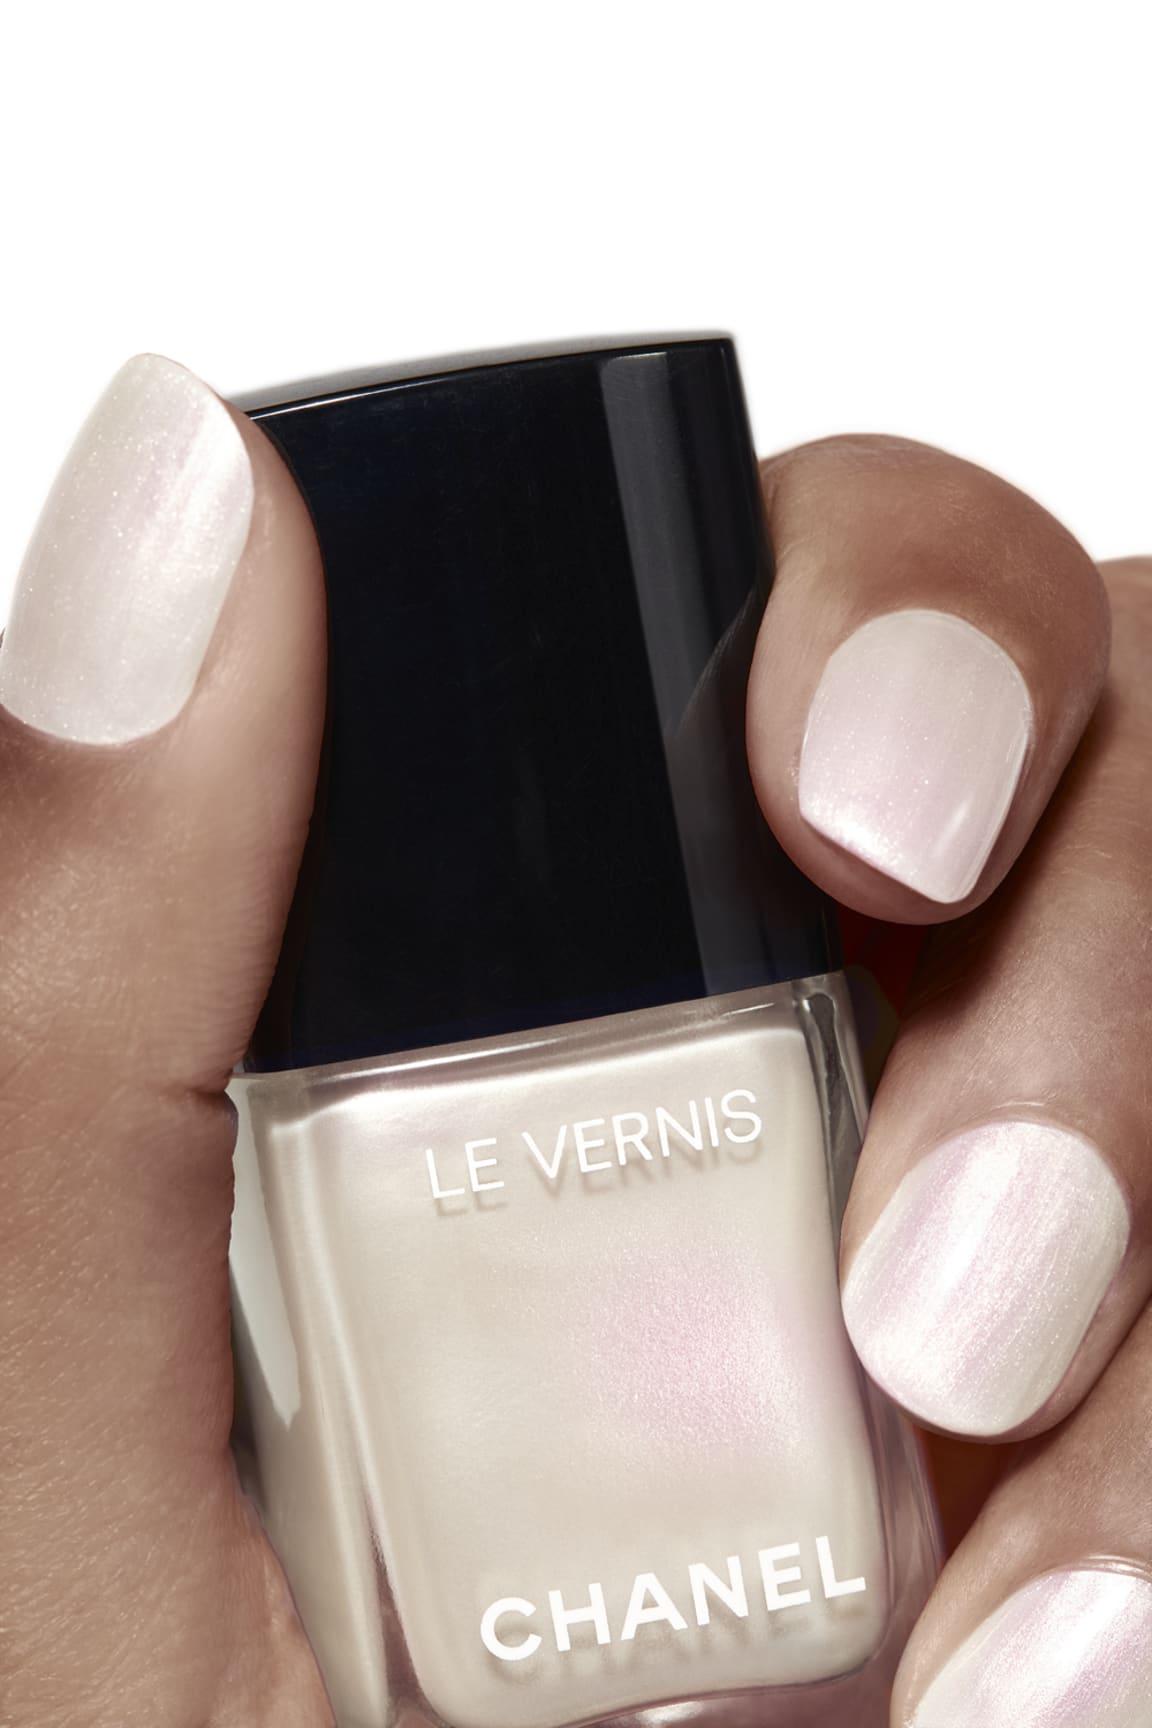 Application makeup visual 1 - LE VERNIS 889 - PERLE BLANCHE